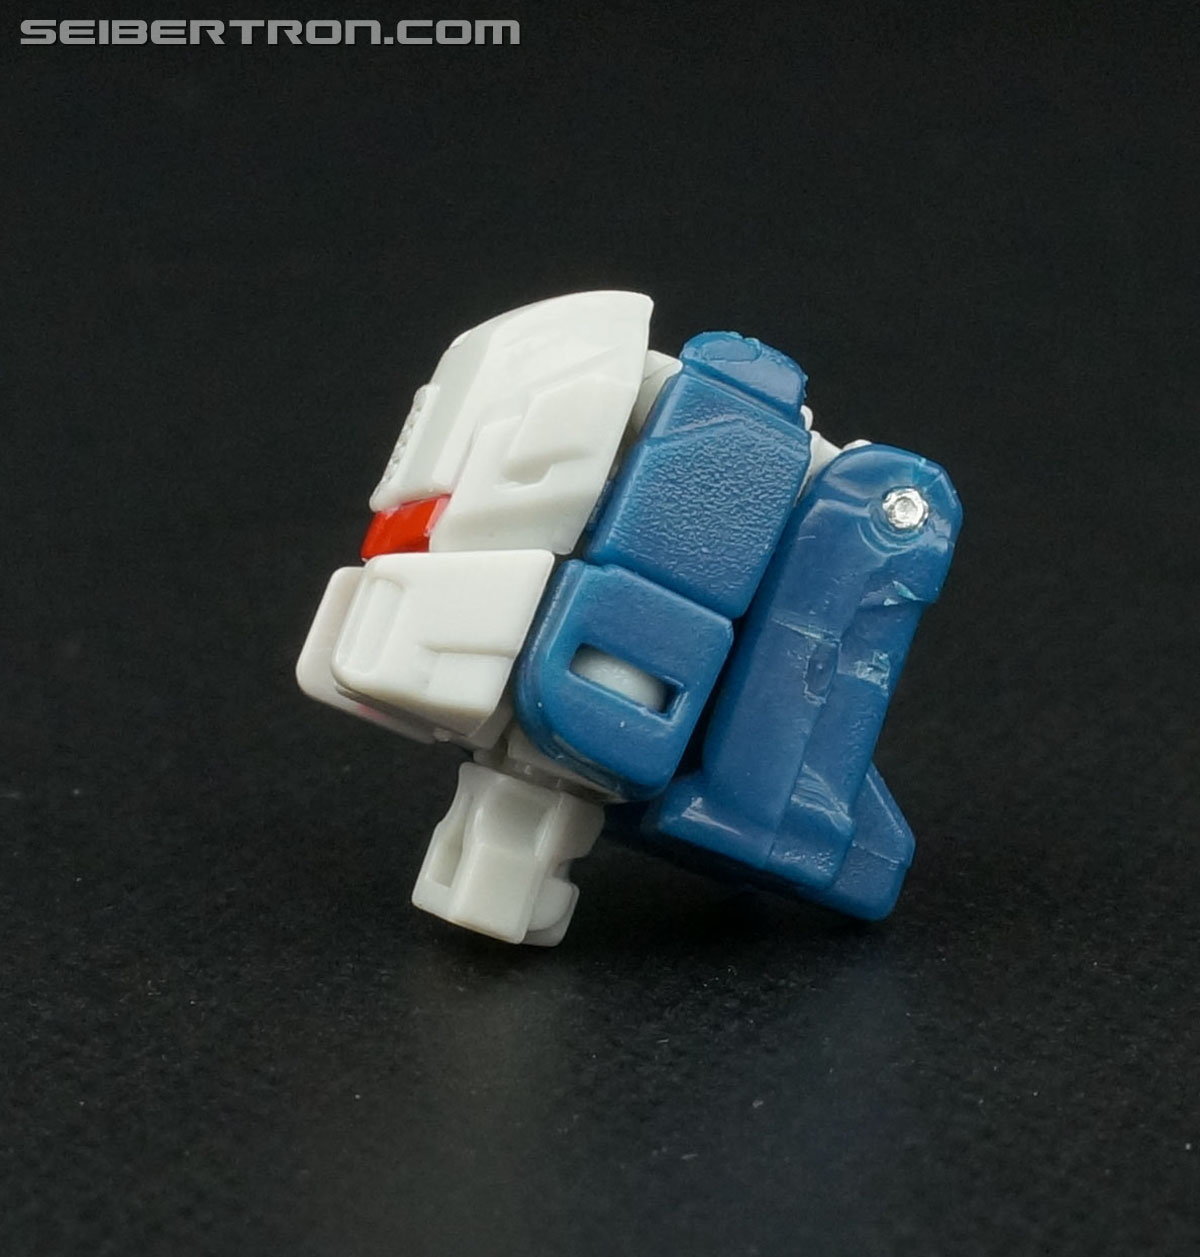 Transformers Titans Return Monxo (Monzo) (Image #33 of 43)